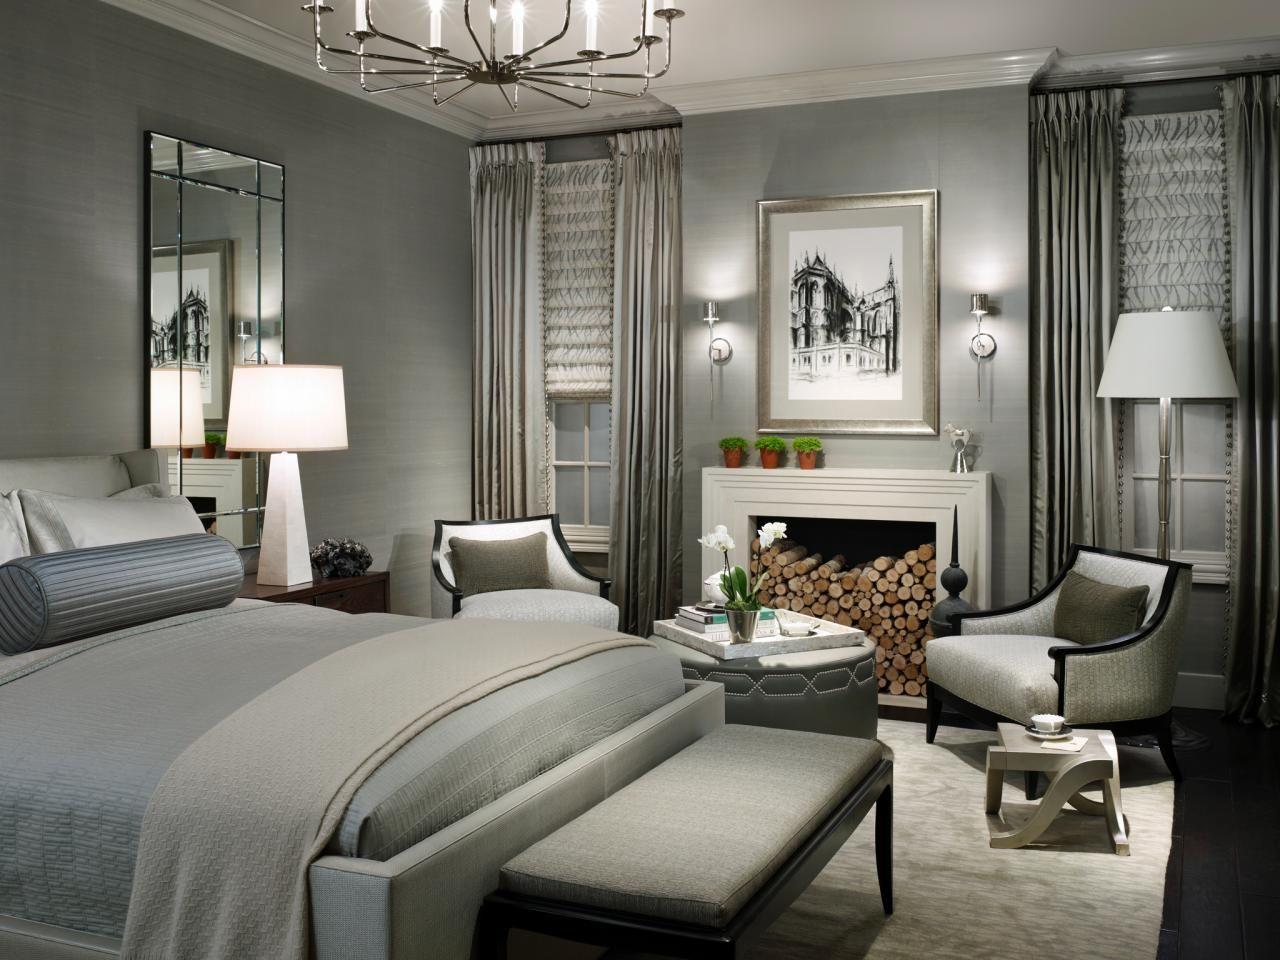 Grey Sophisticated bedroom color scheme